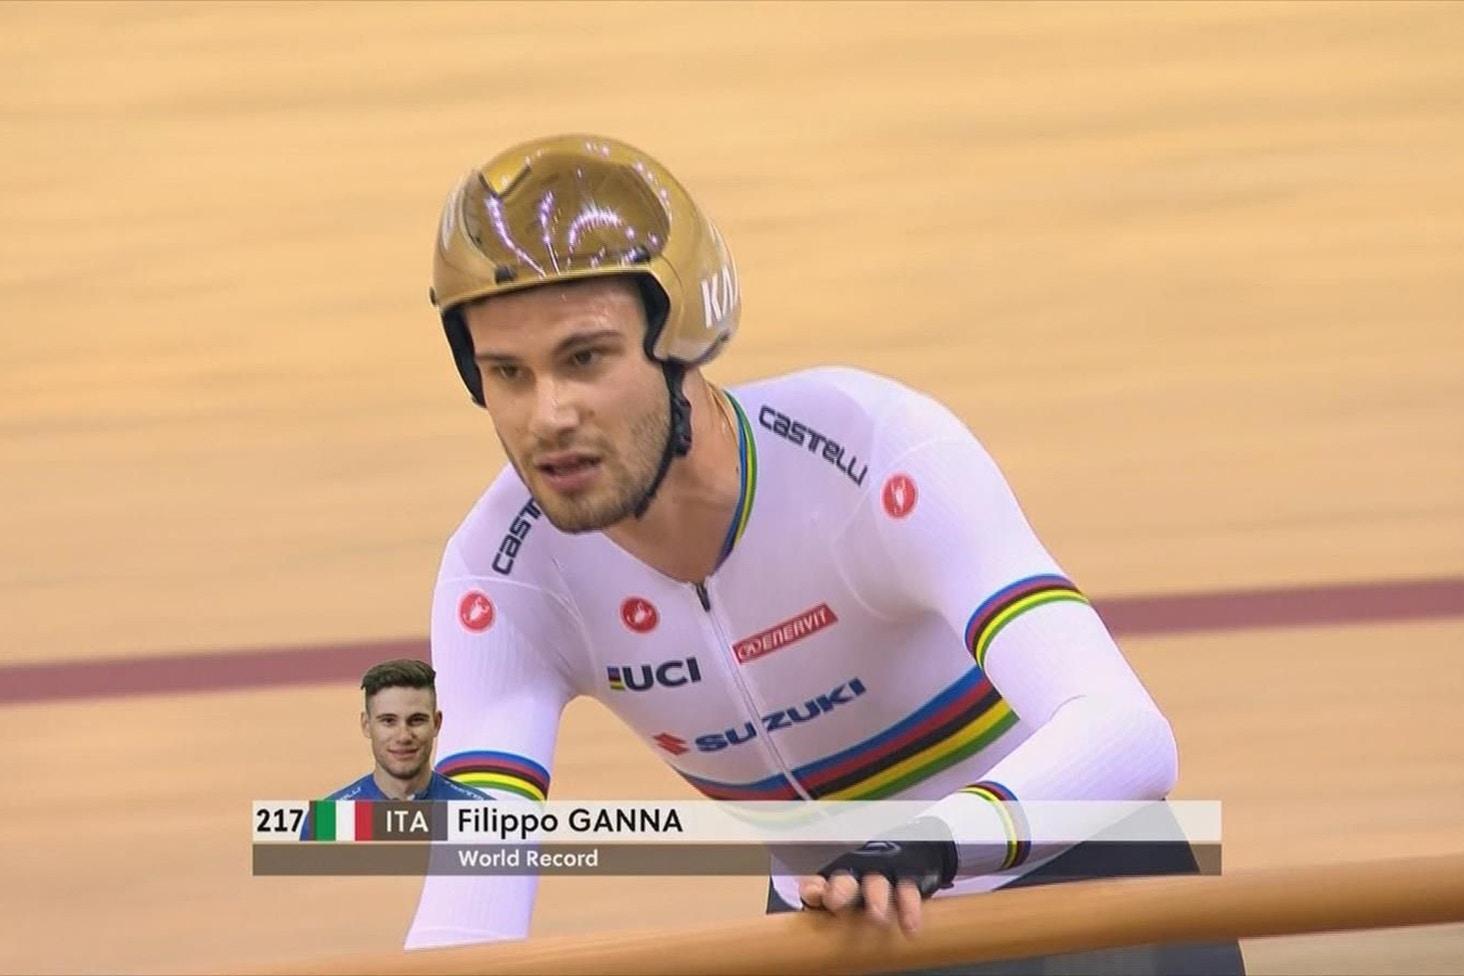 Northwave - Filippo Ganna is already a legend